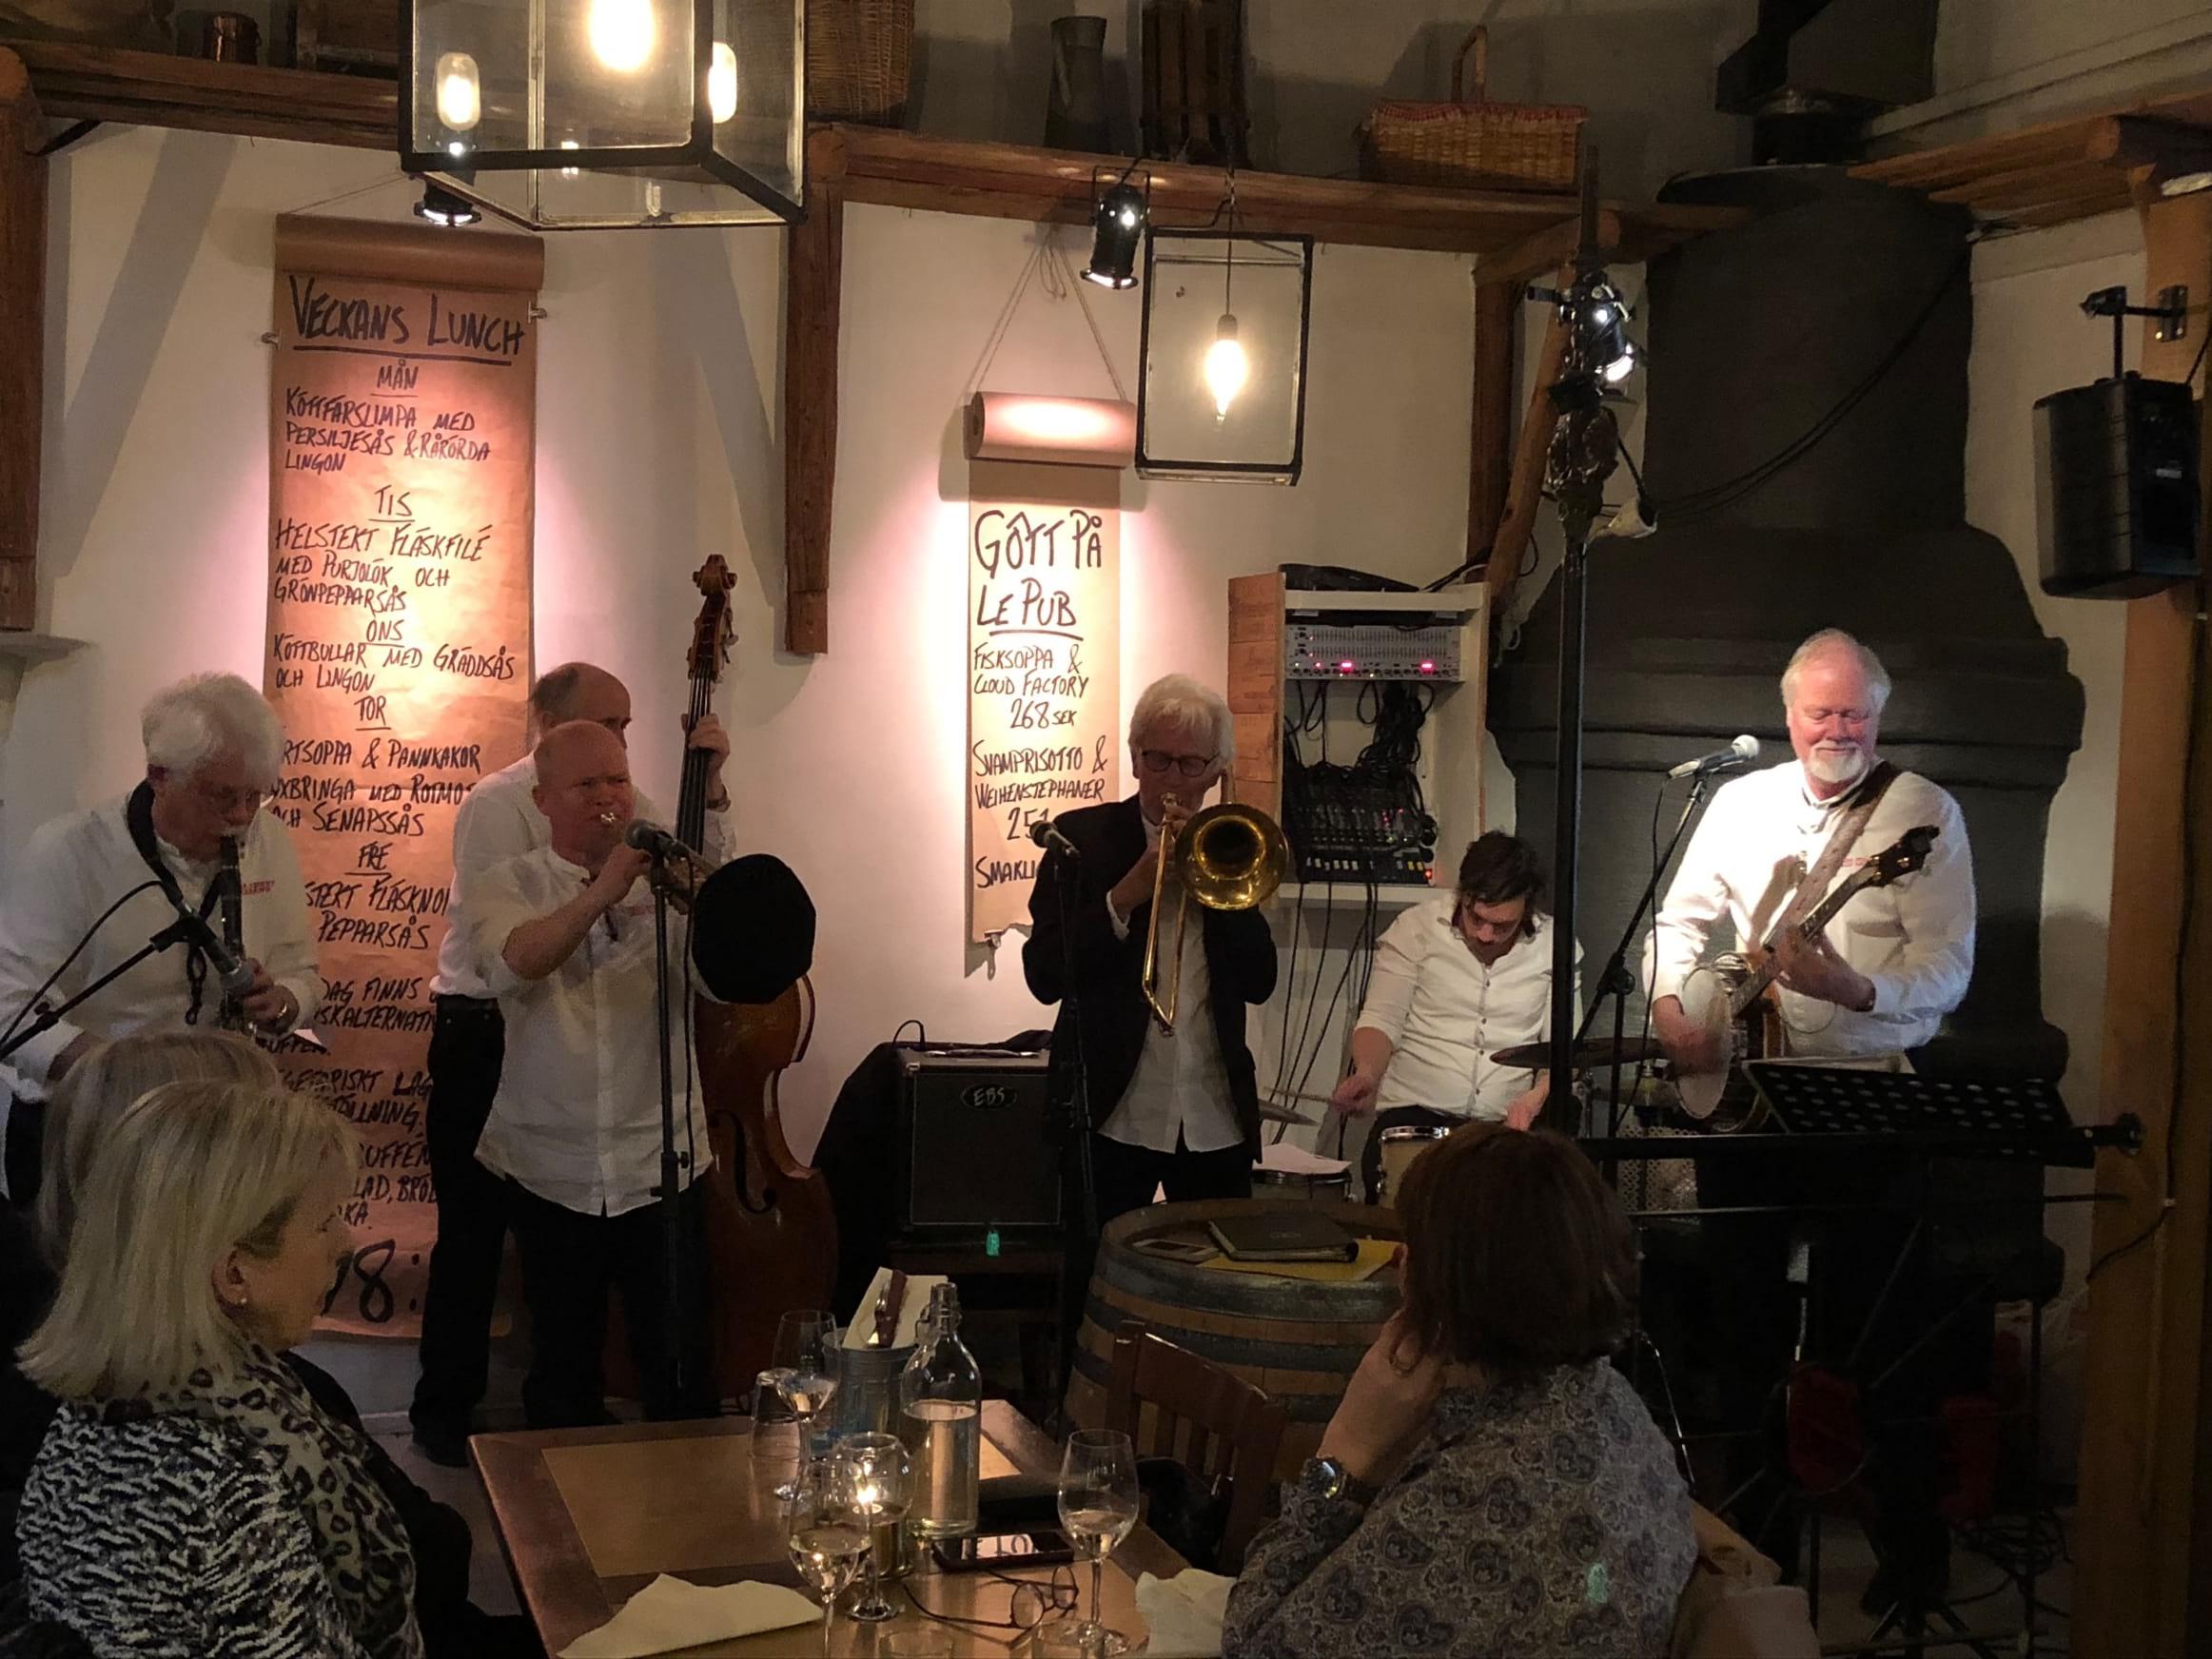 Jazzbandet Papa Piders